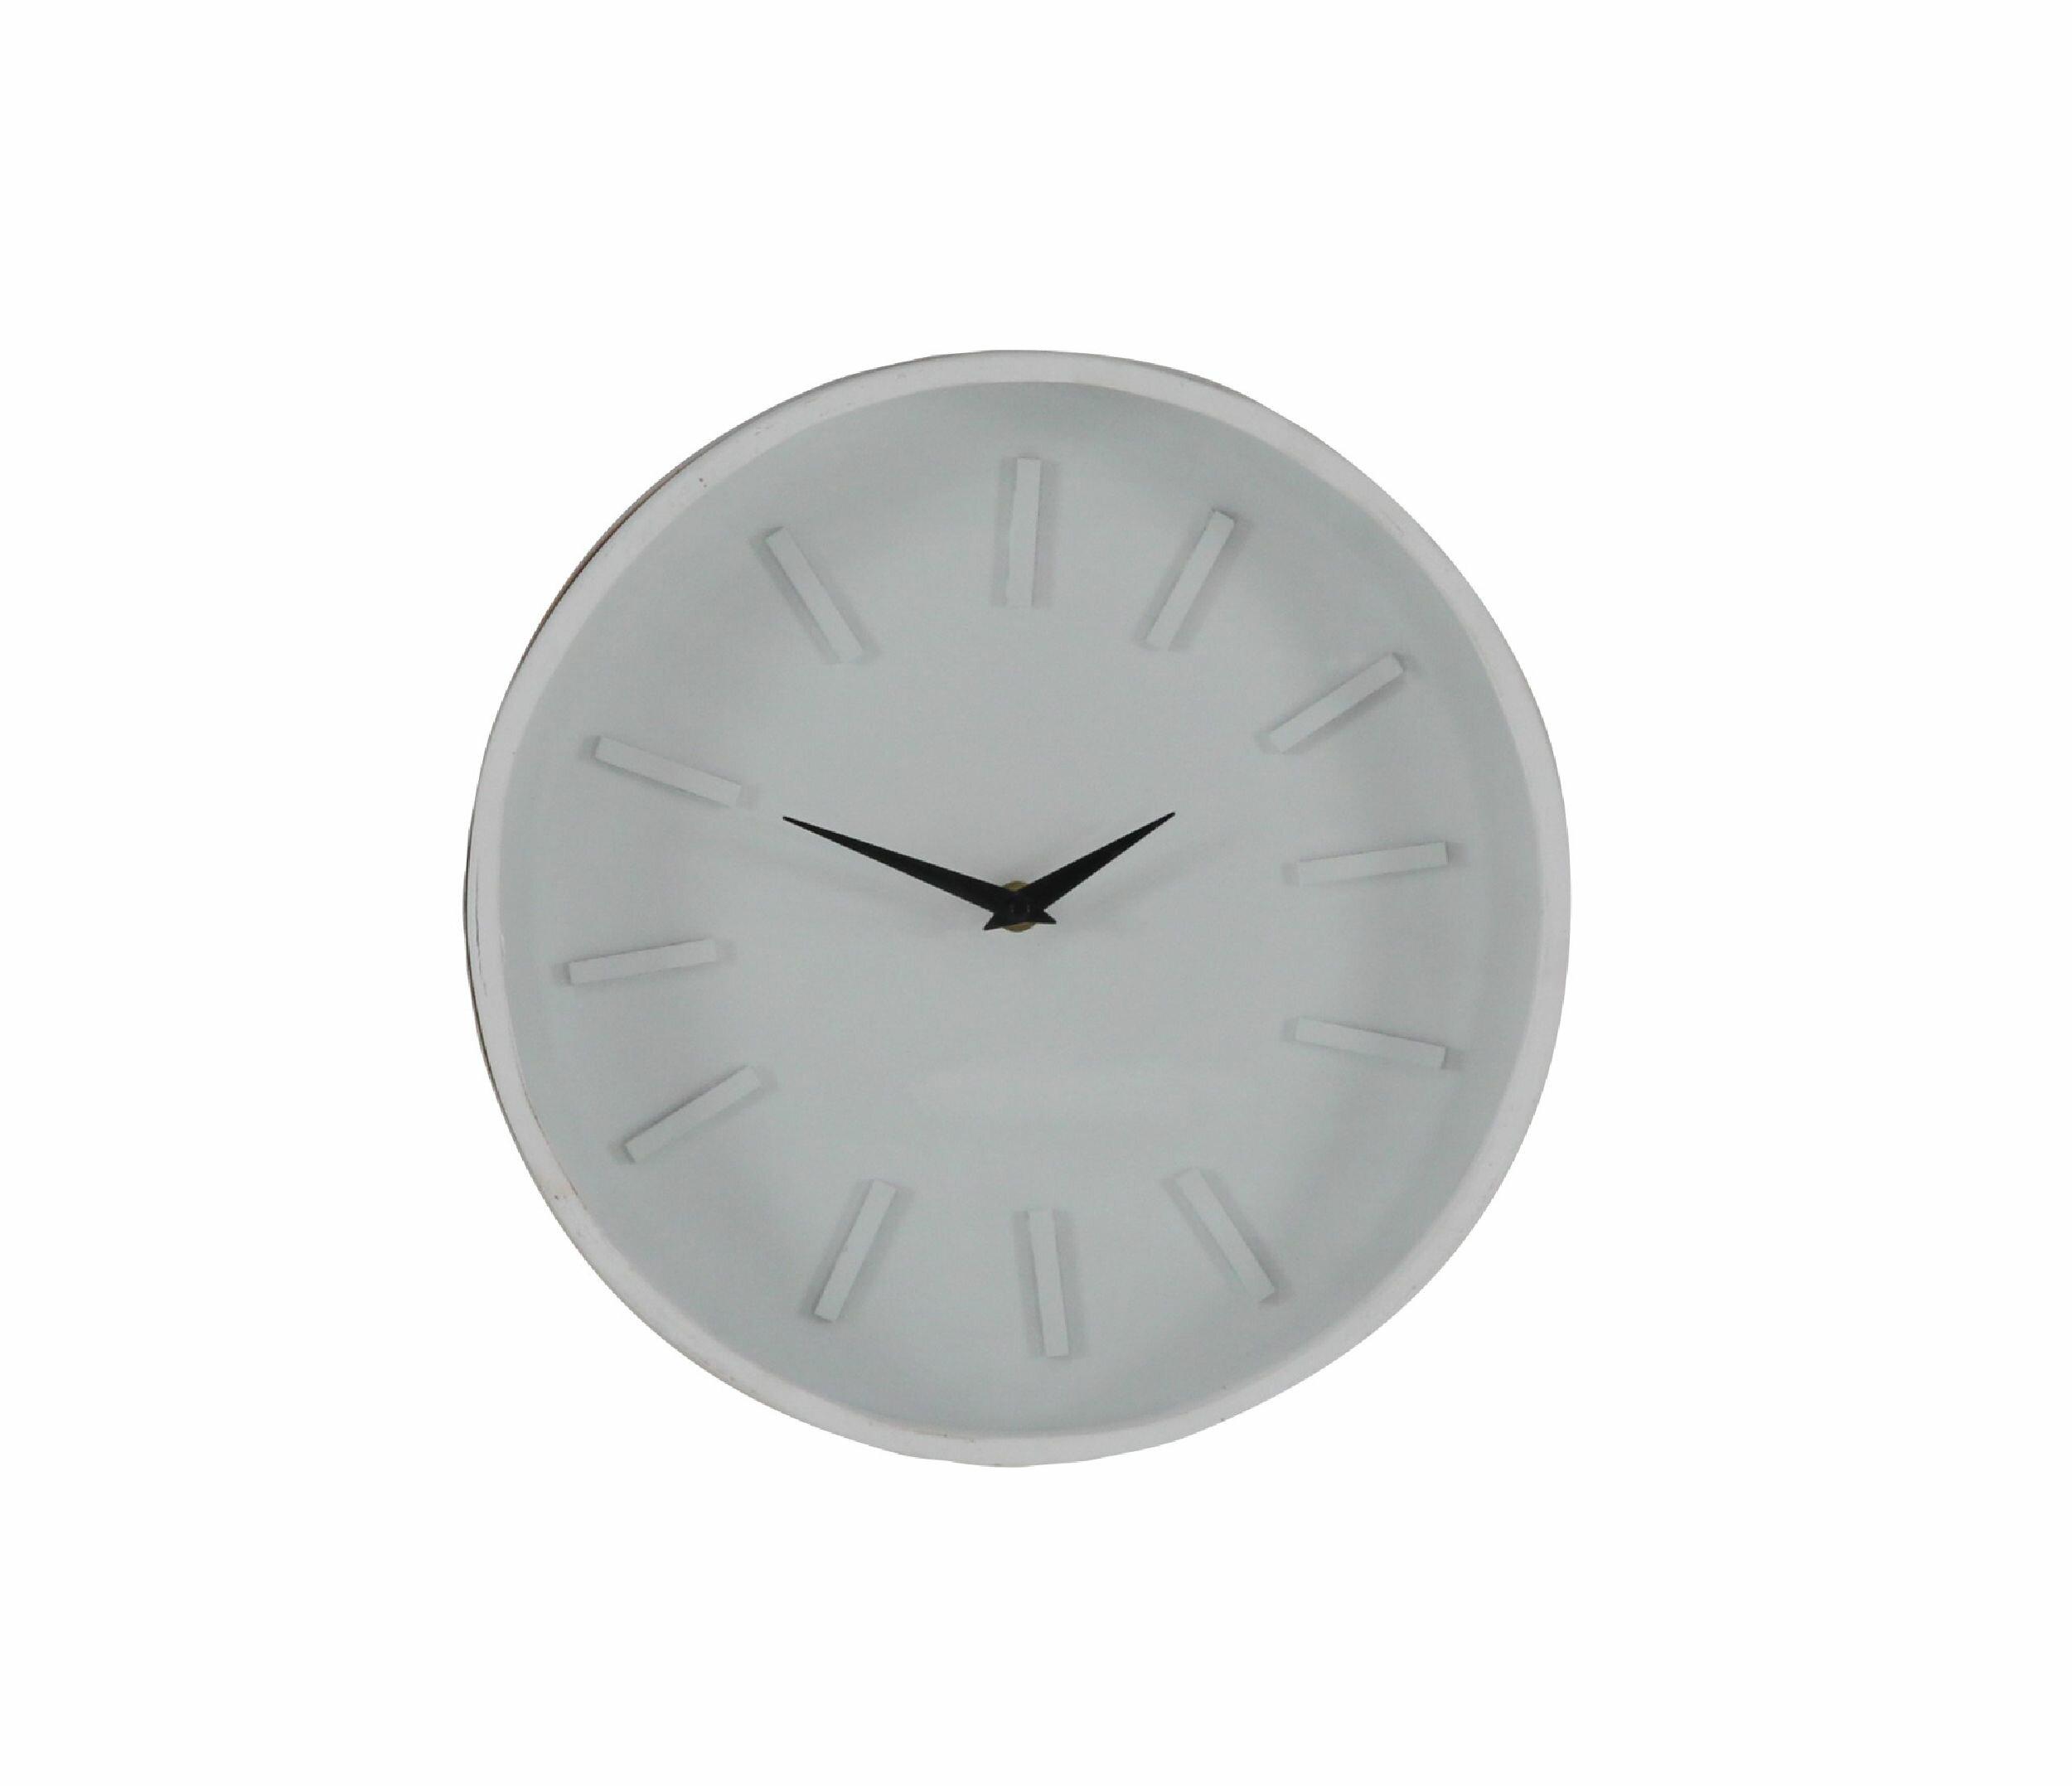 . Modern Round Analog Wall Clock